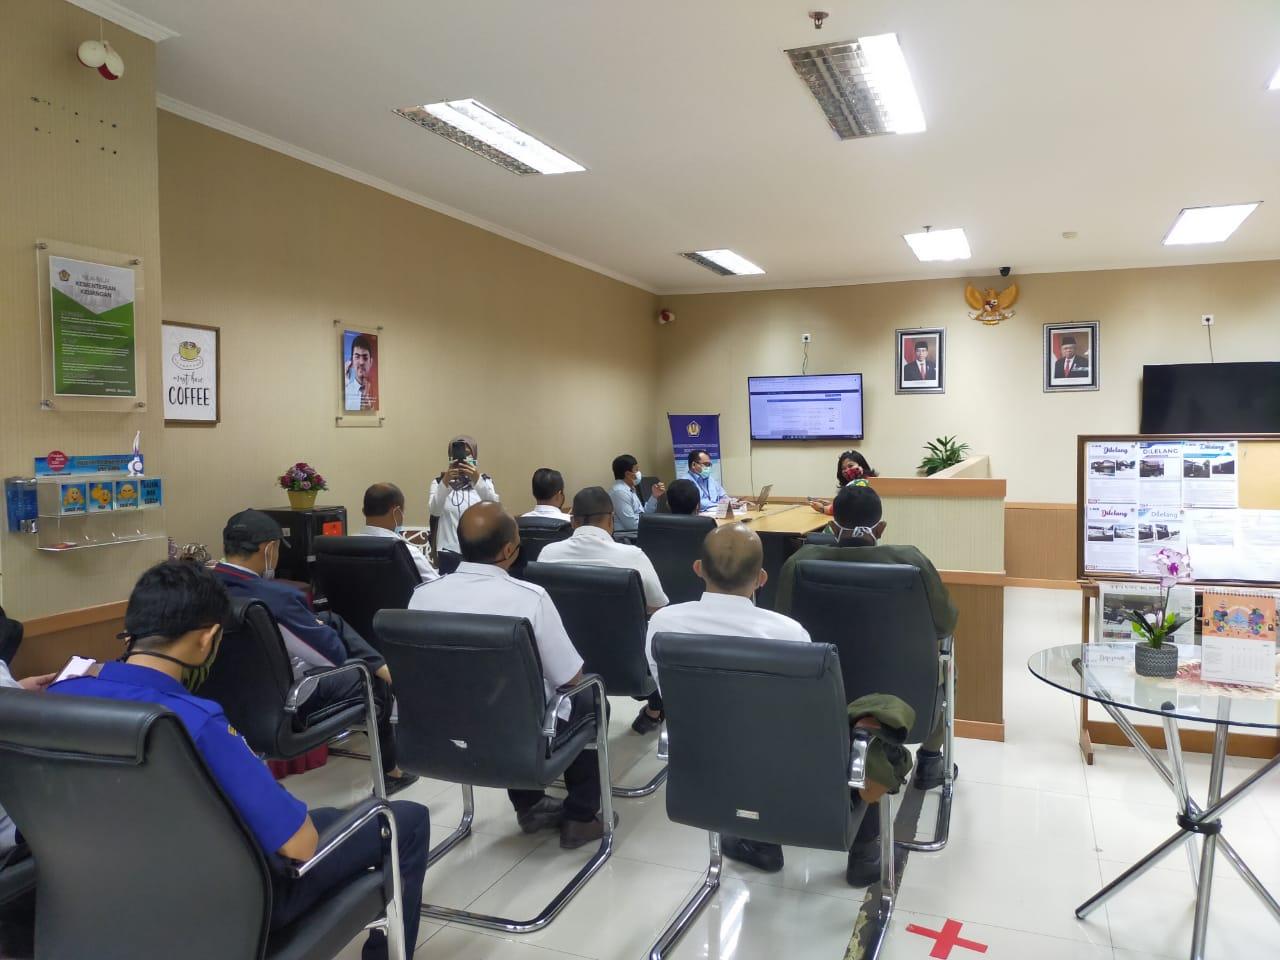 Kanwil DJKN Jabar Bersinergi dengan Pemkot Bandung, Gelar Program Magang bagi Pegawai Pemkot di Masa Pandemi Covid-19